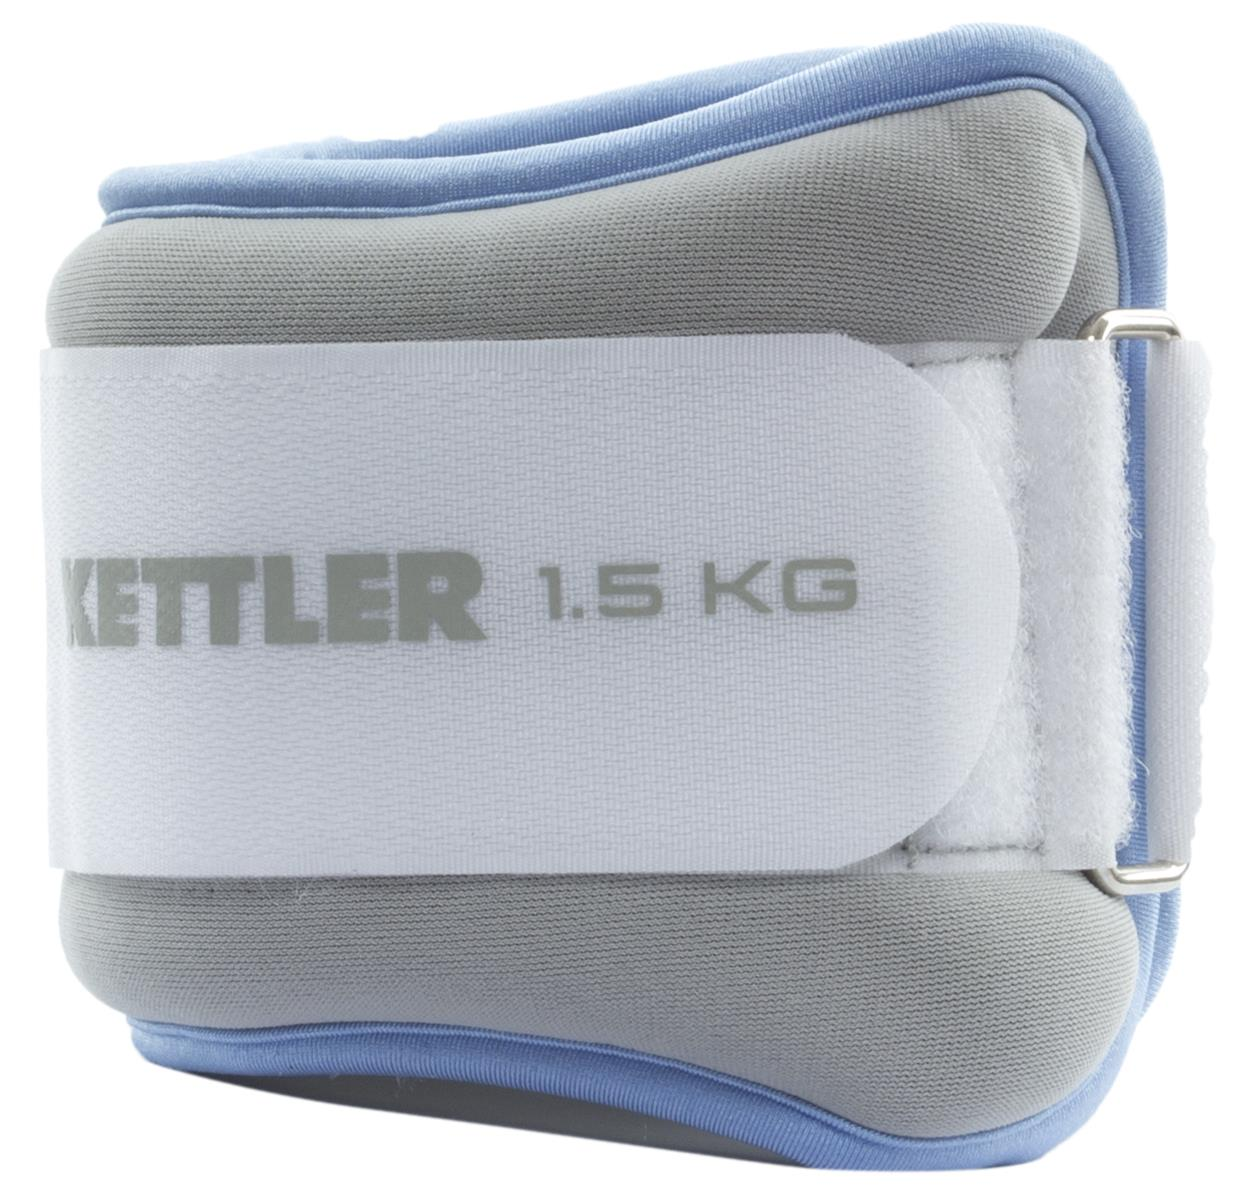 Утяжелитель для ног Kettler, 2 х 1,5 кг